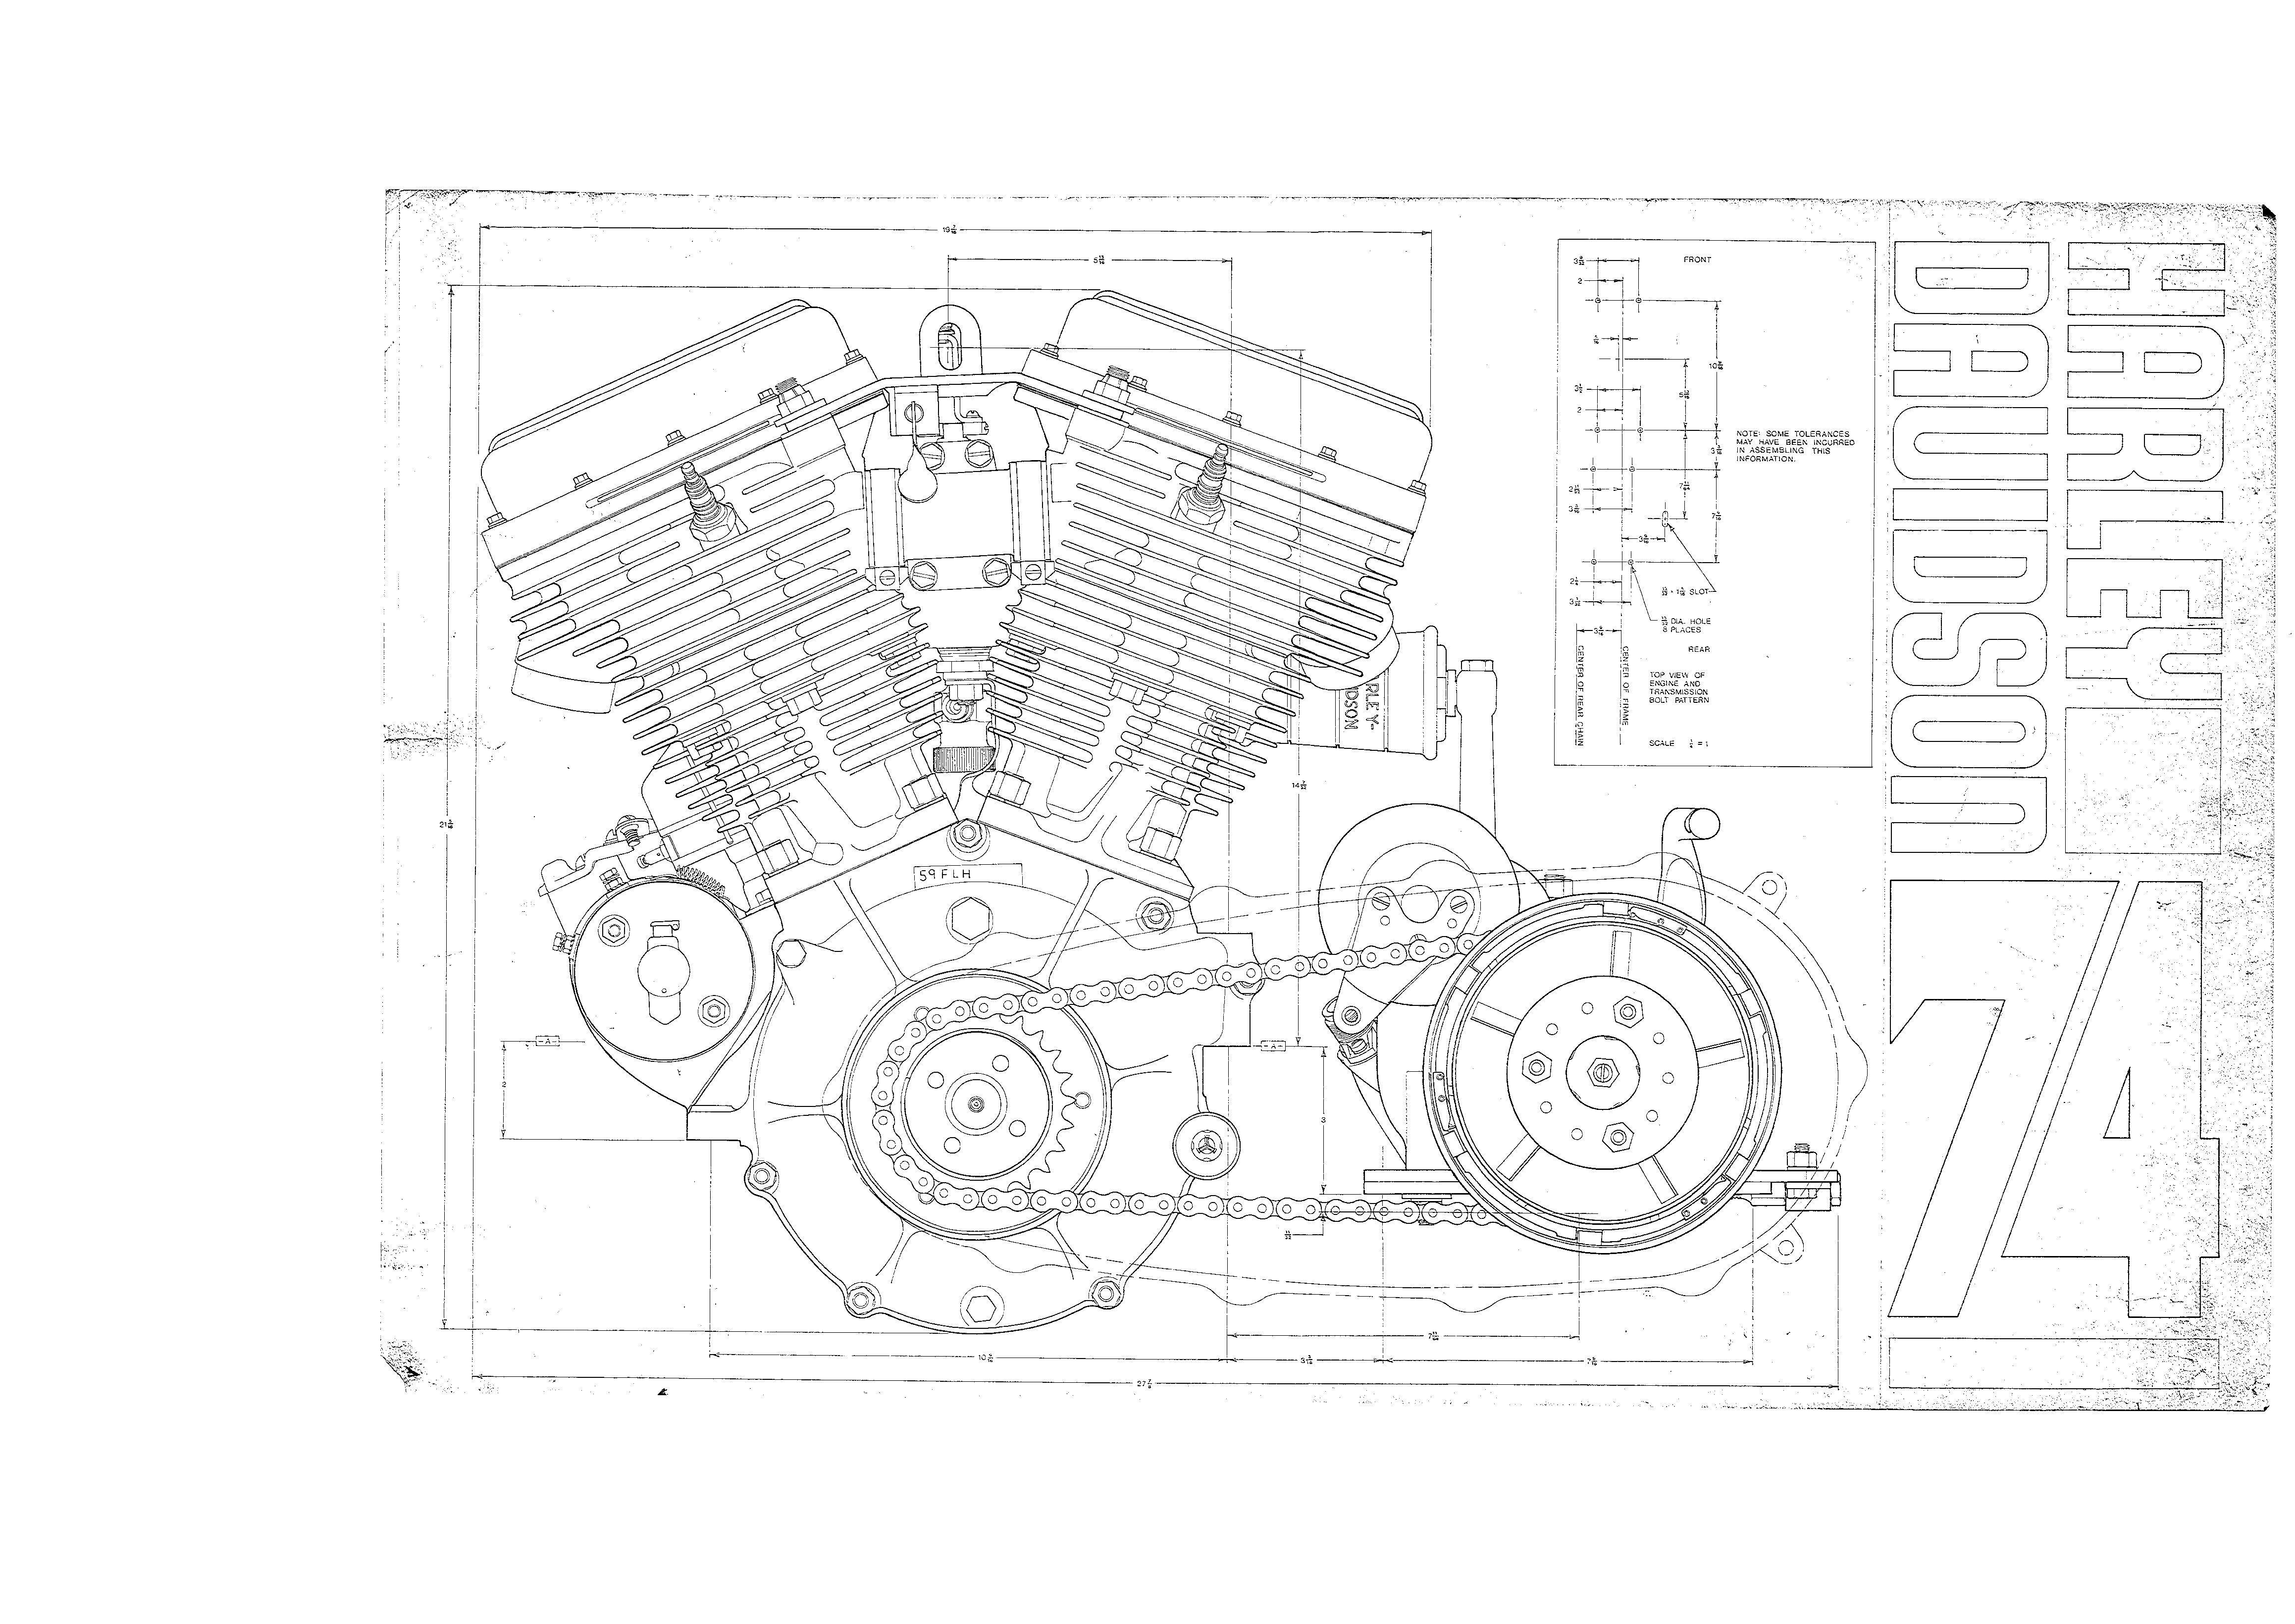 small resolution of harley davidson motor harley davidson forum bike engine prop design custom harleys character design references engineering motorcycle